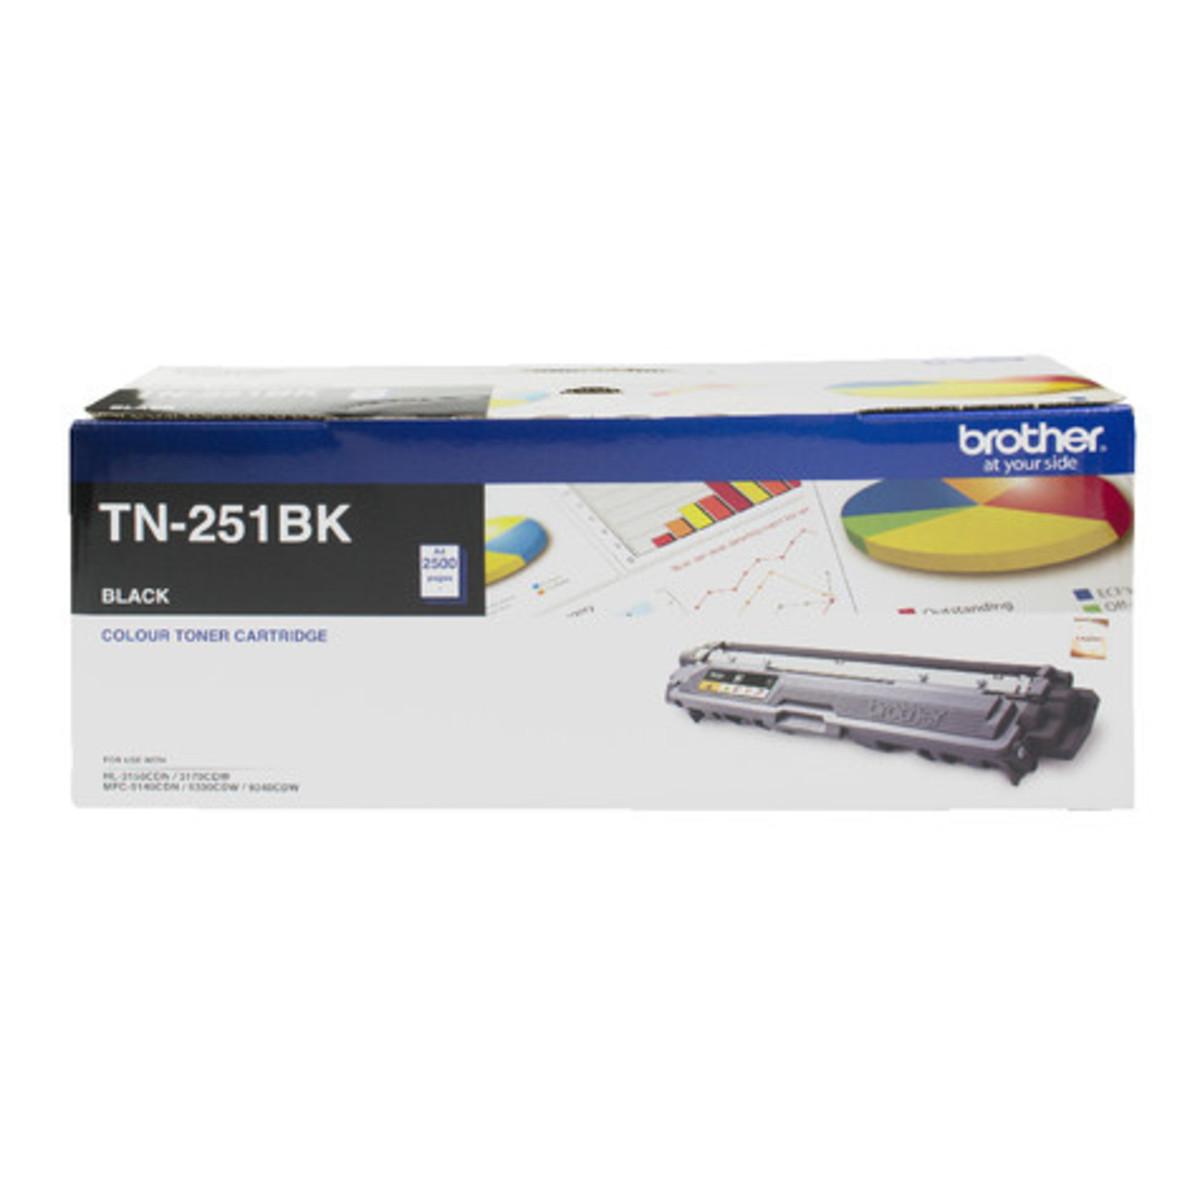 Brother TN-251BK Black Toner Cartridge